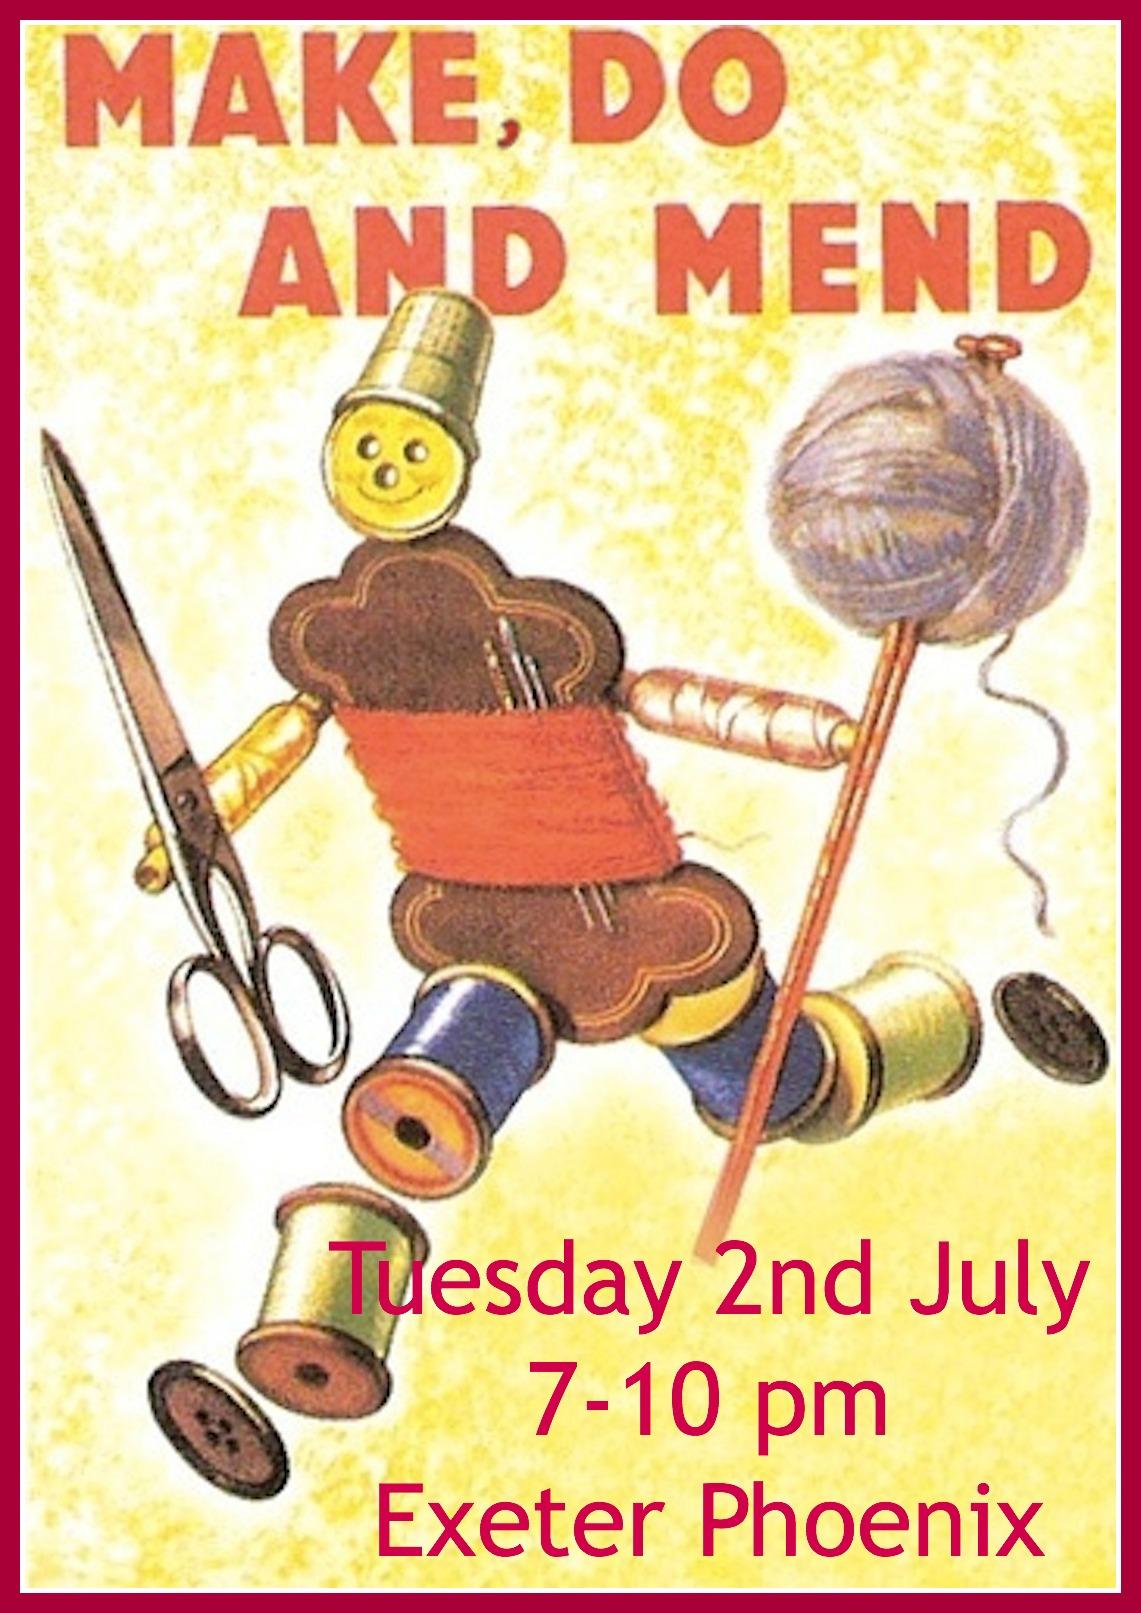 make, do & mend man July 2013